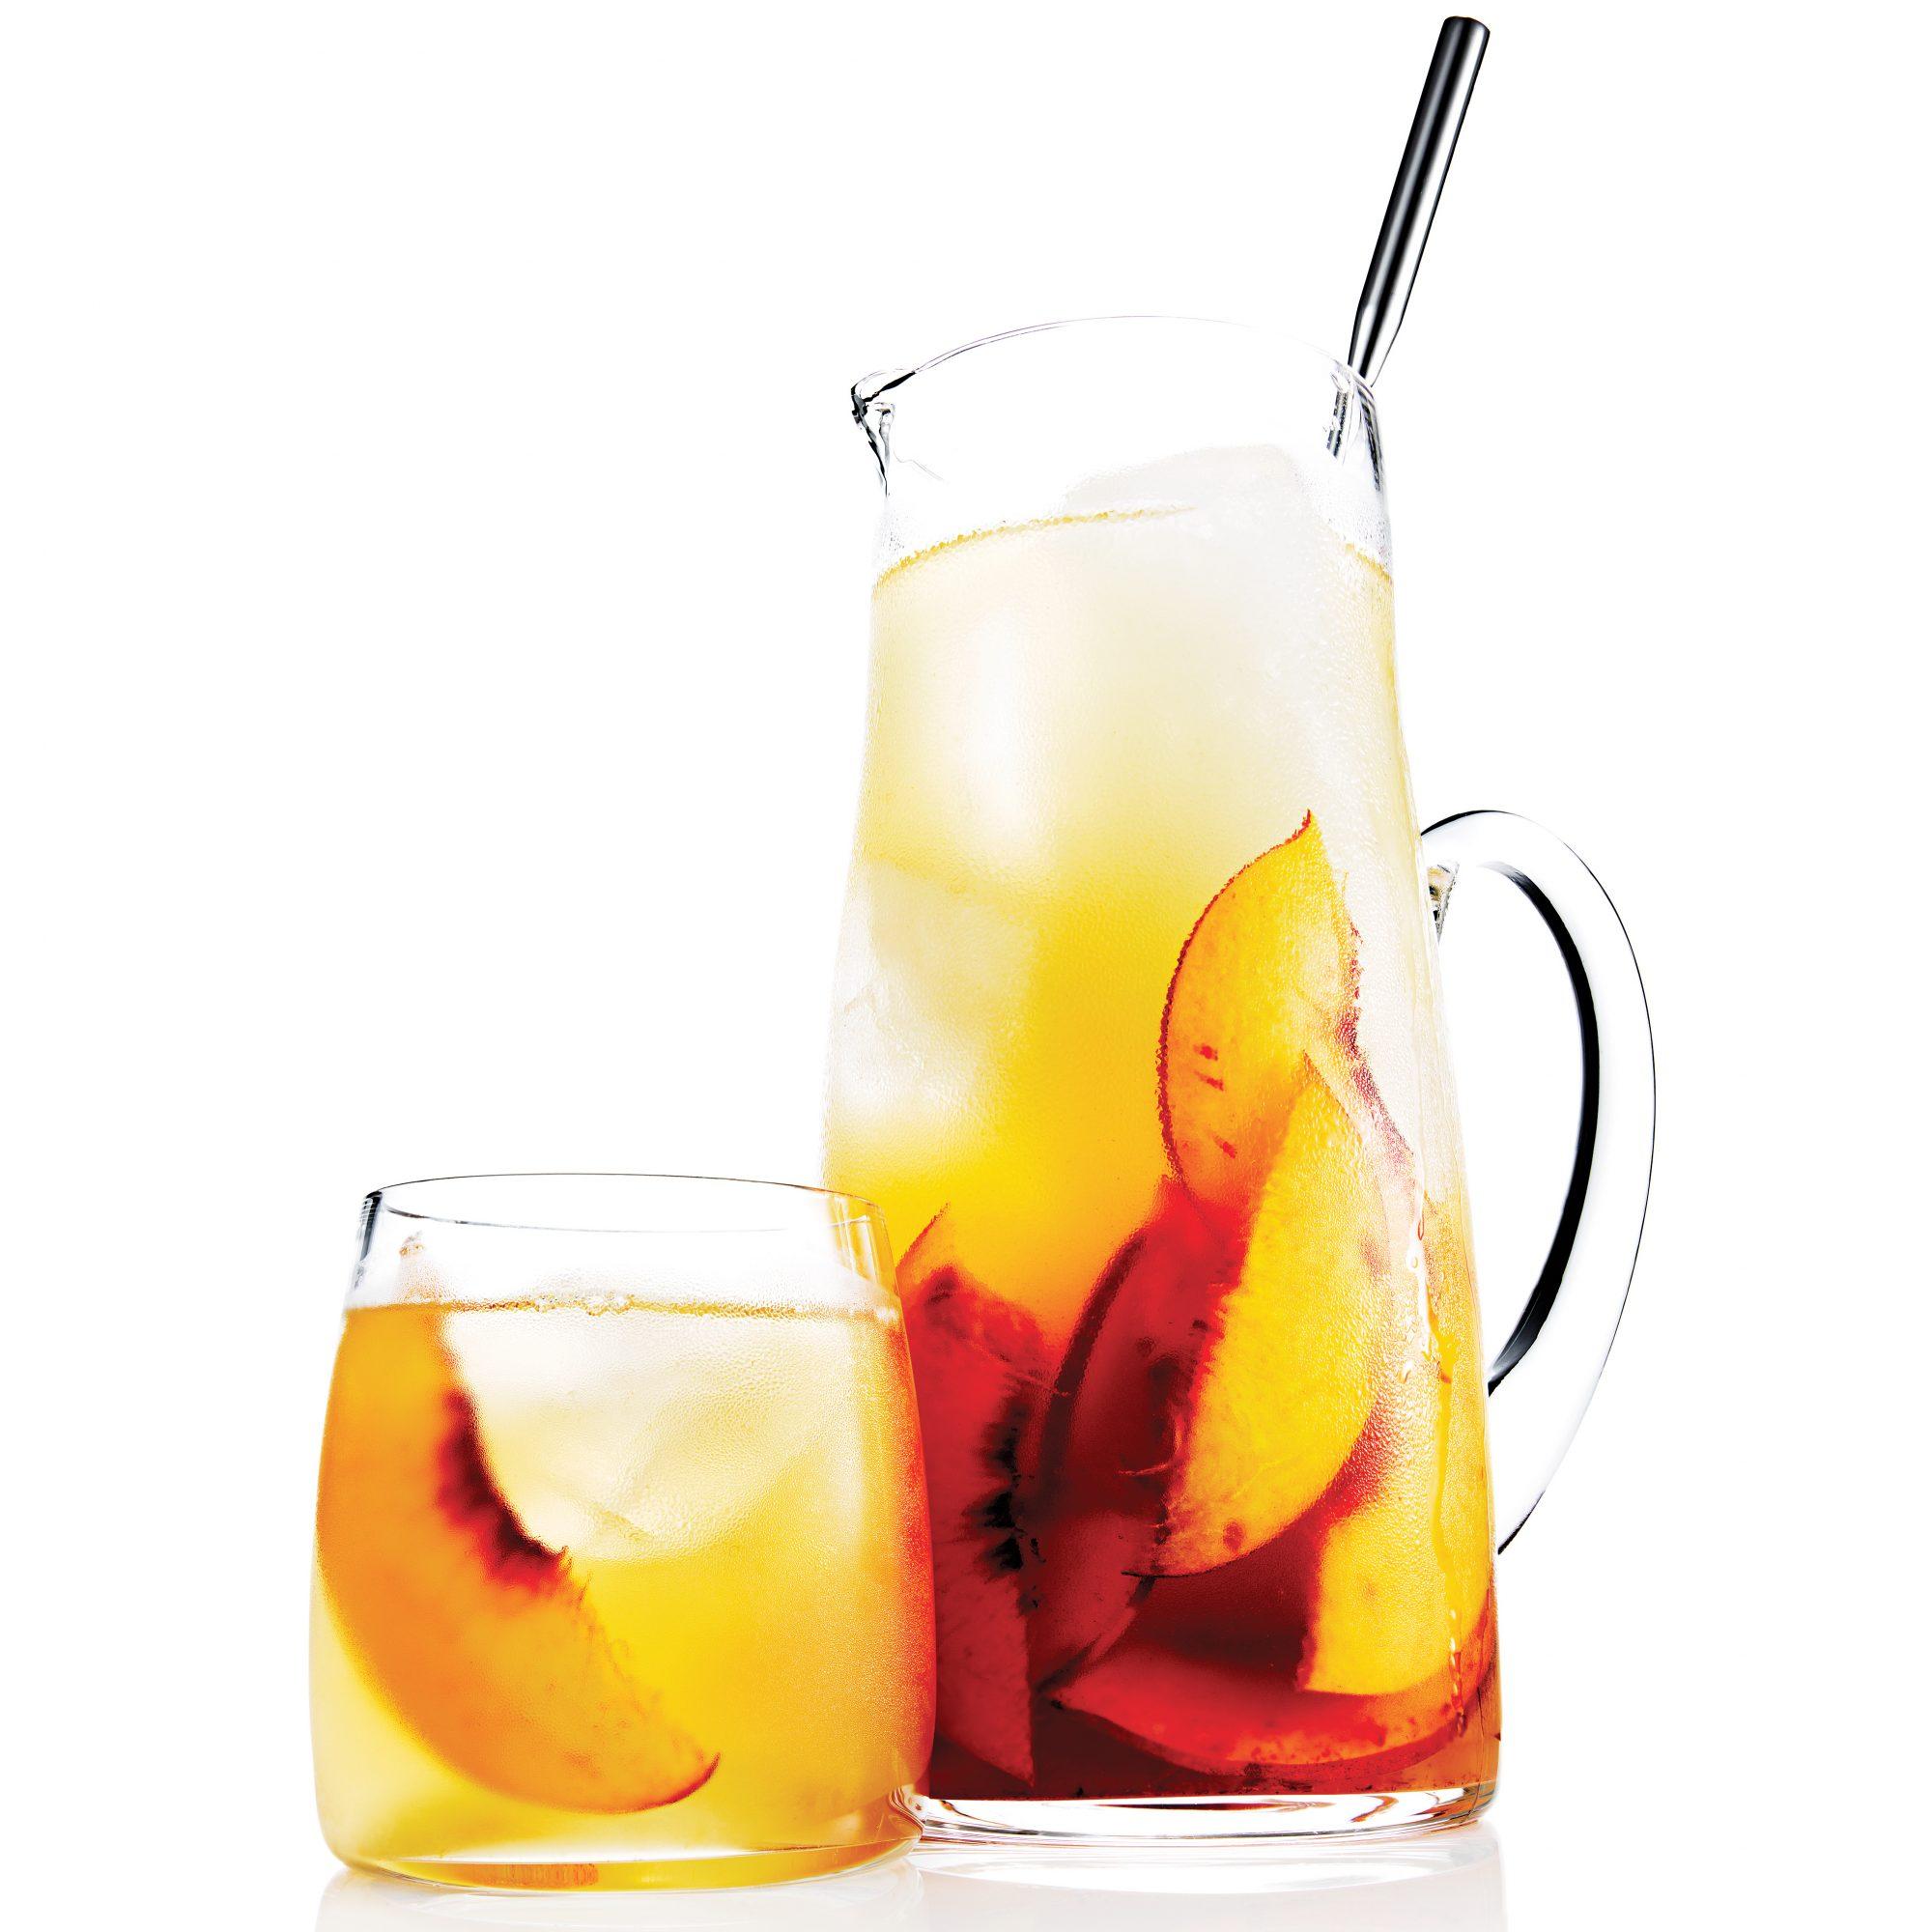 Bourbon and Peach Sweet Tea Punch